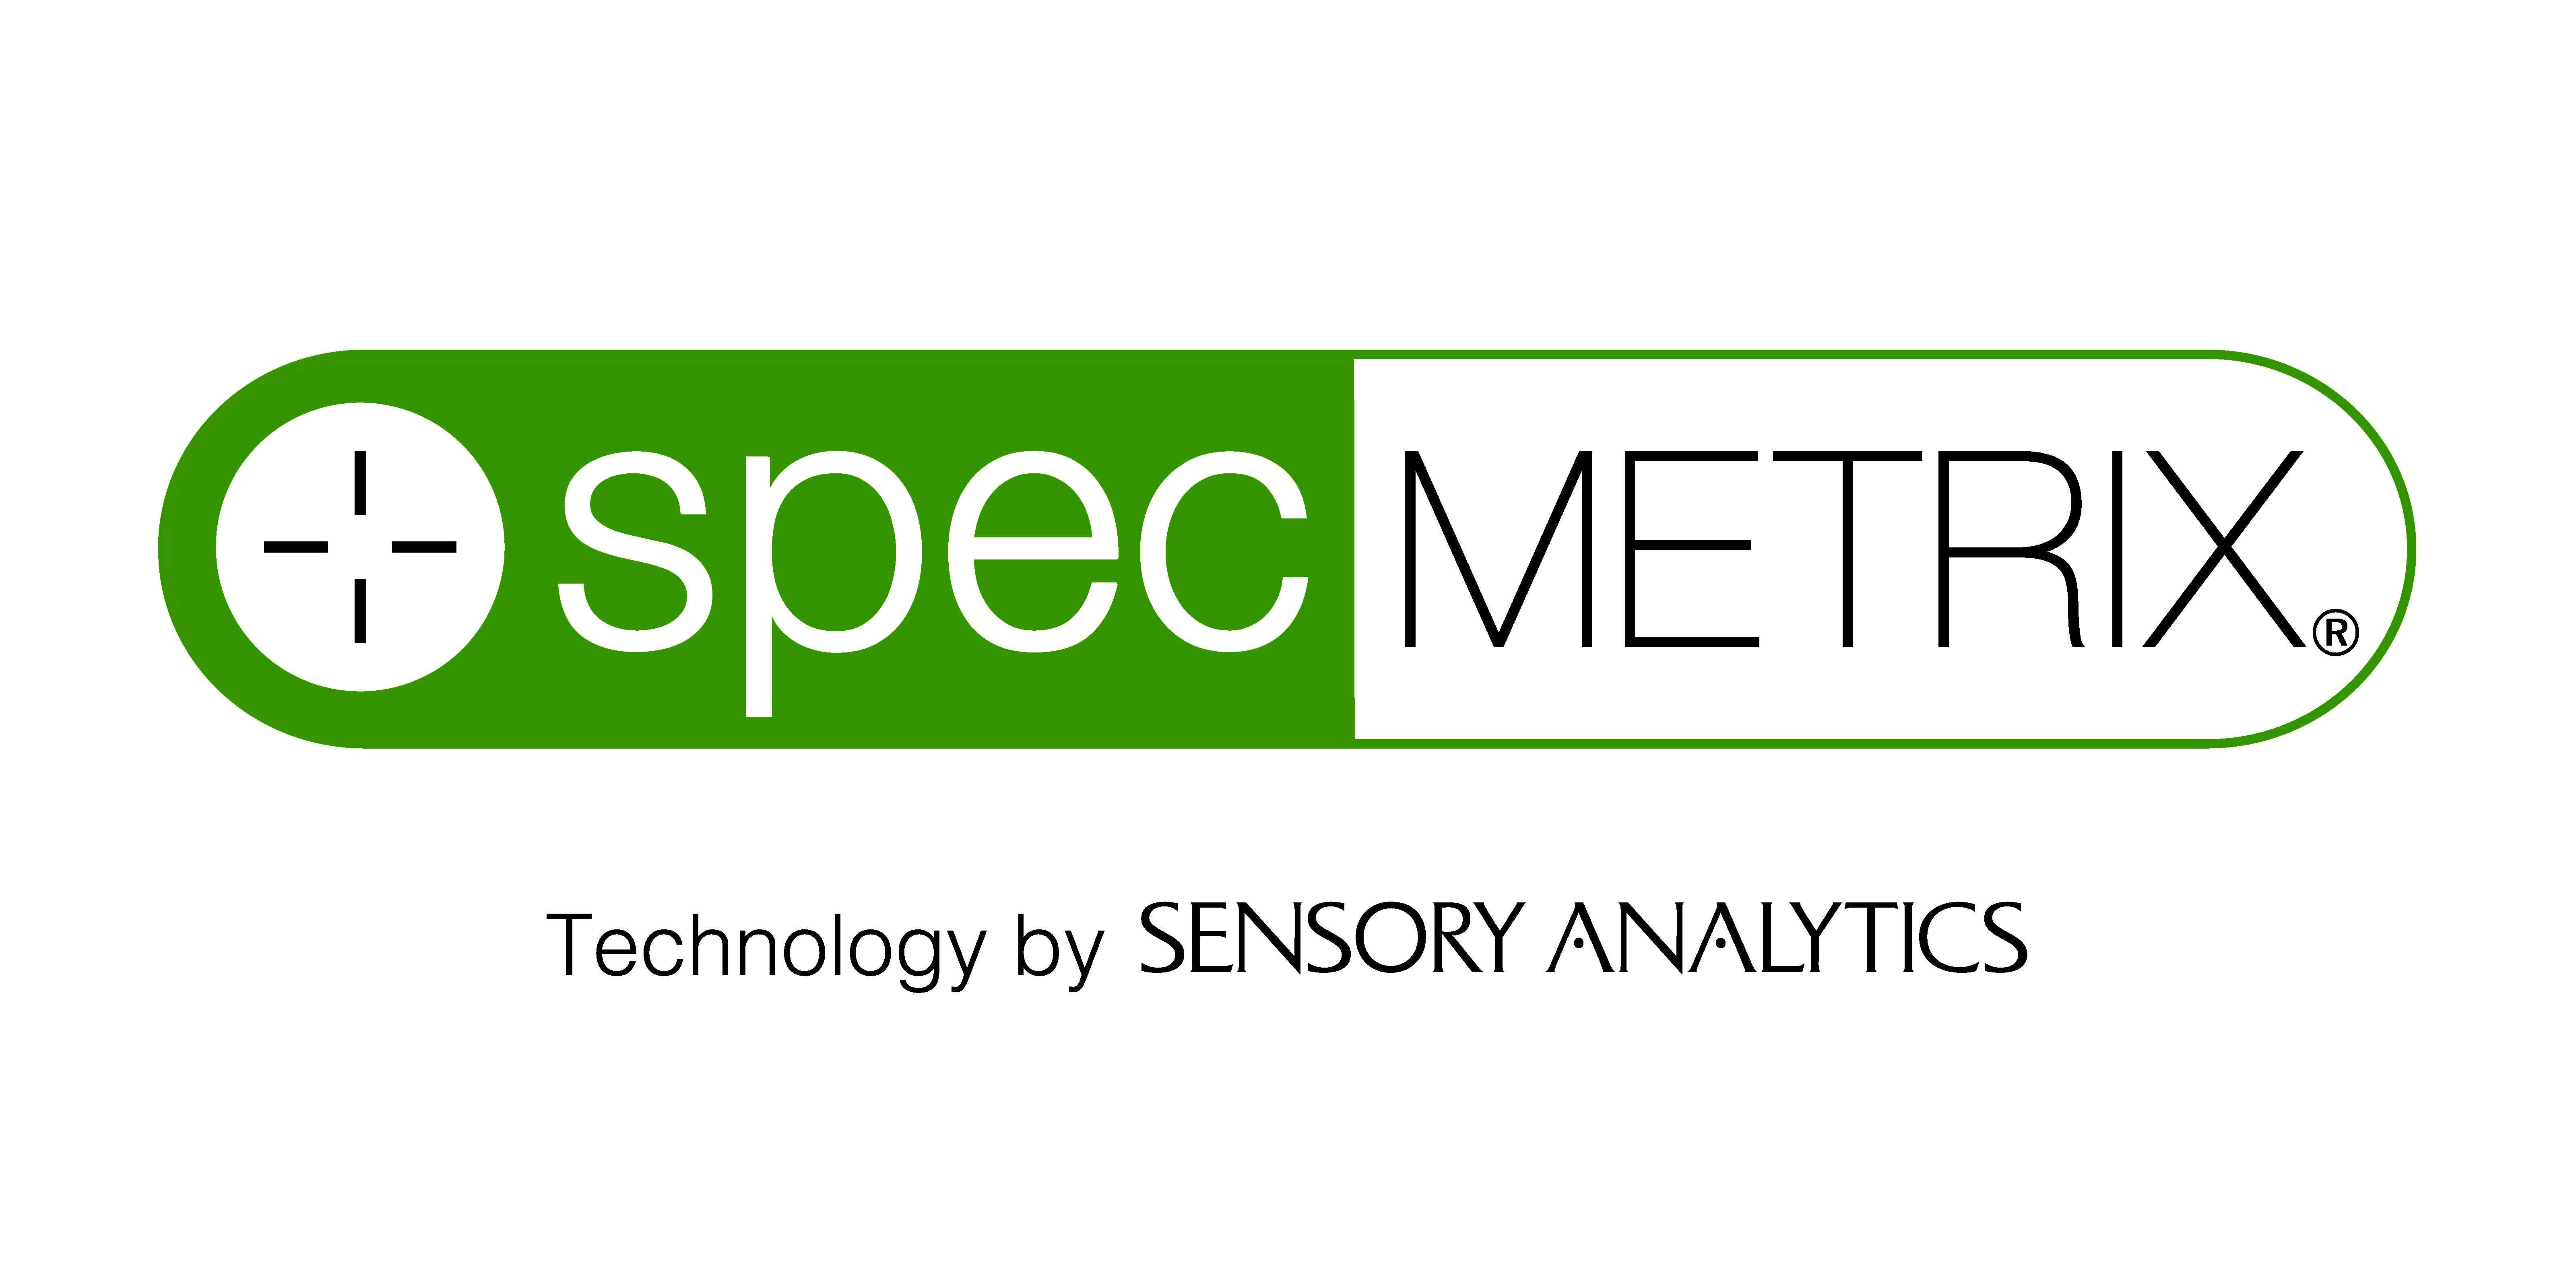 SpecMetrix_TechnologybySA_R.JPG